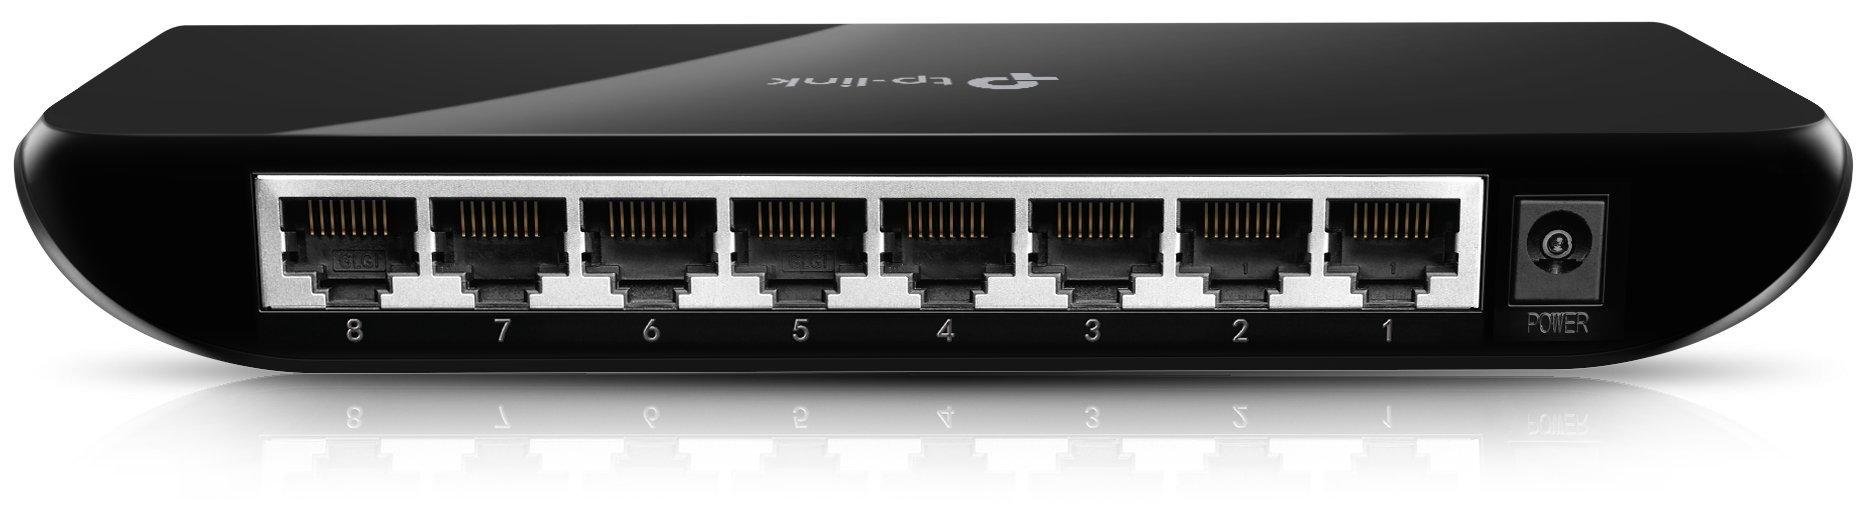 Tp Link 8 Port Gigabit Ethernet Plastic Desktop Switch Tl Sg1008d Capacity8 Modelgigabit The